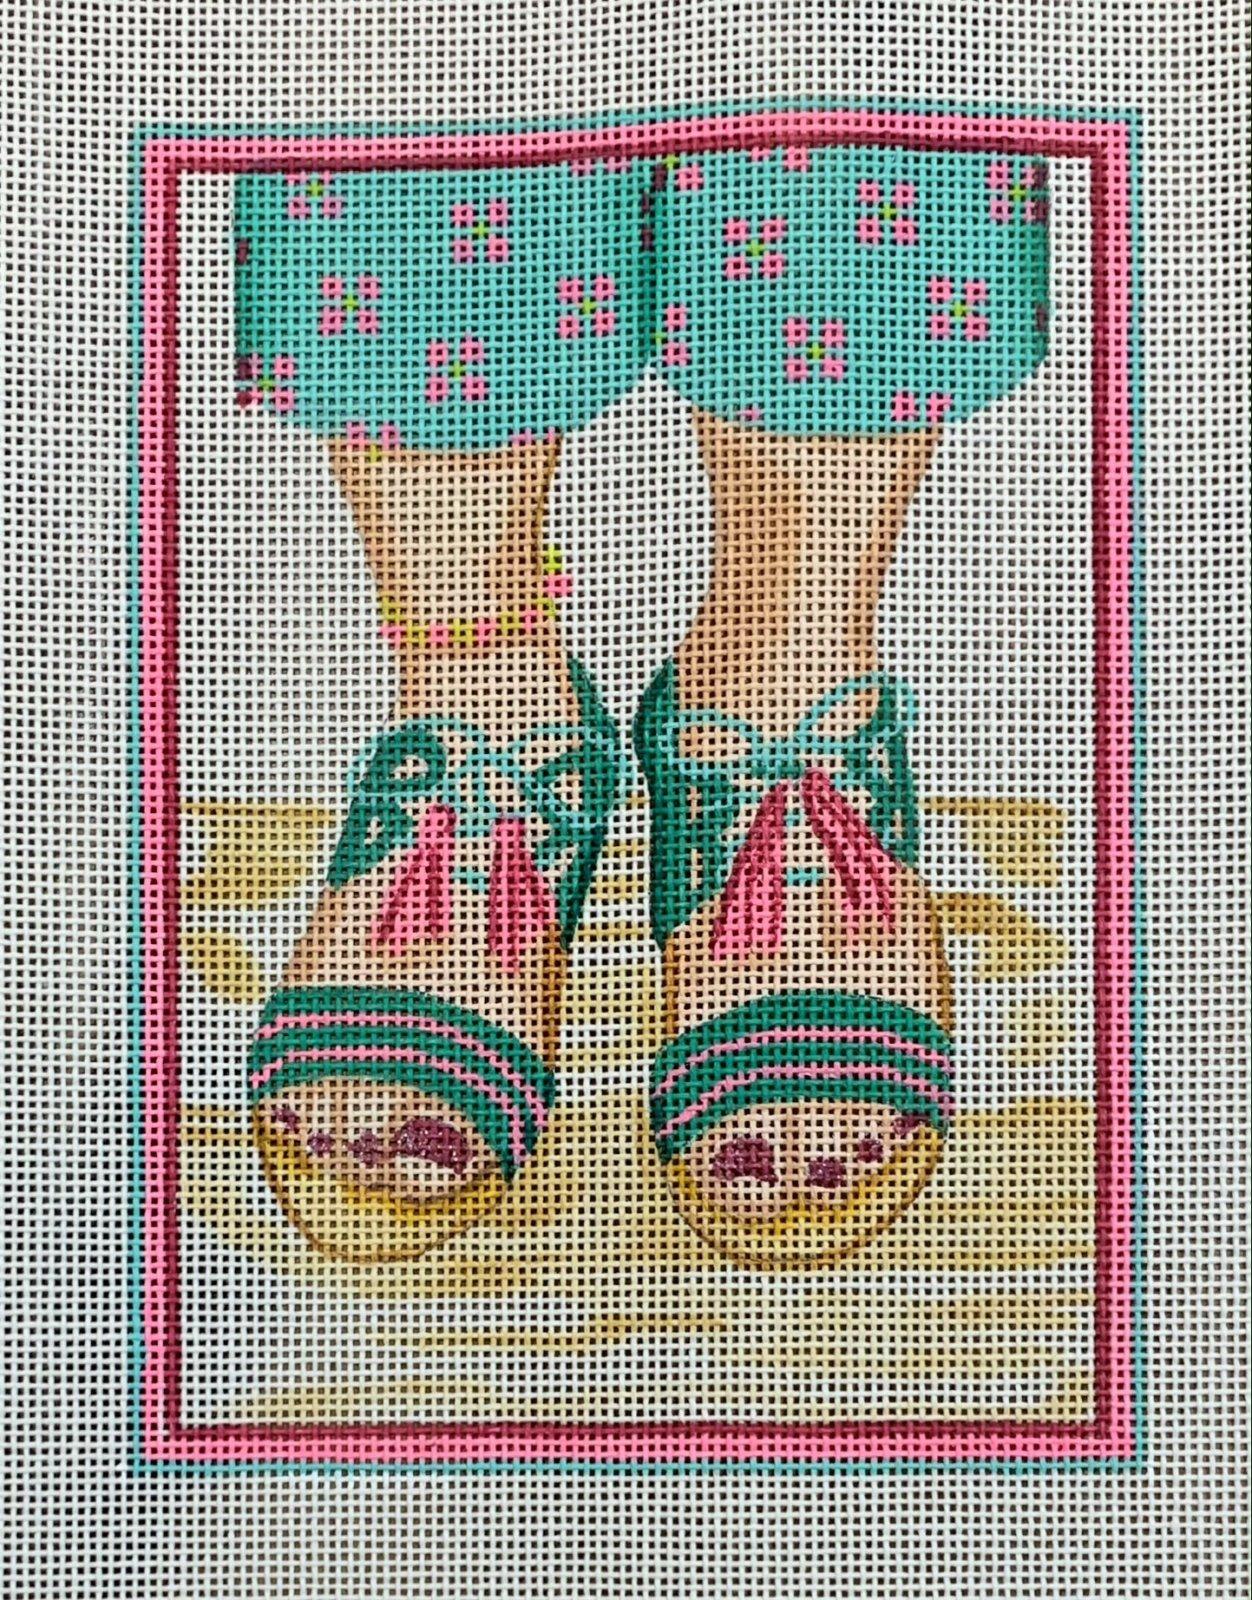 Here's Looking at Shoe - Tassel-tie Sandals - turq jade hot pink